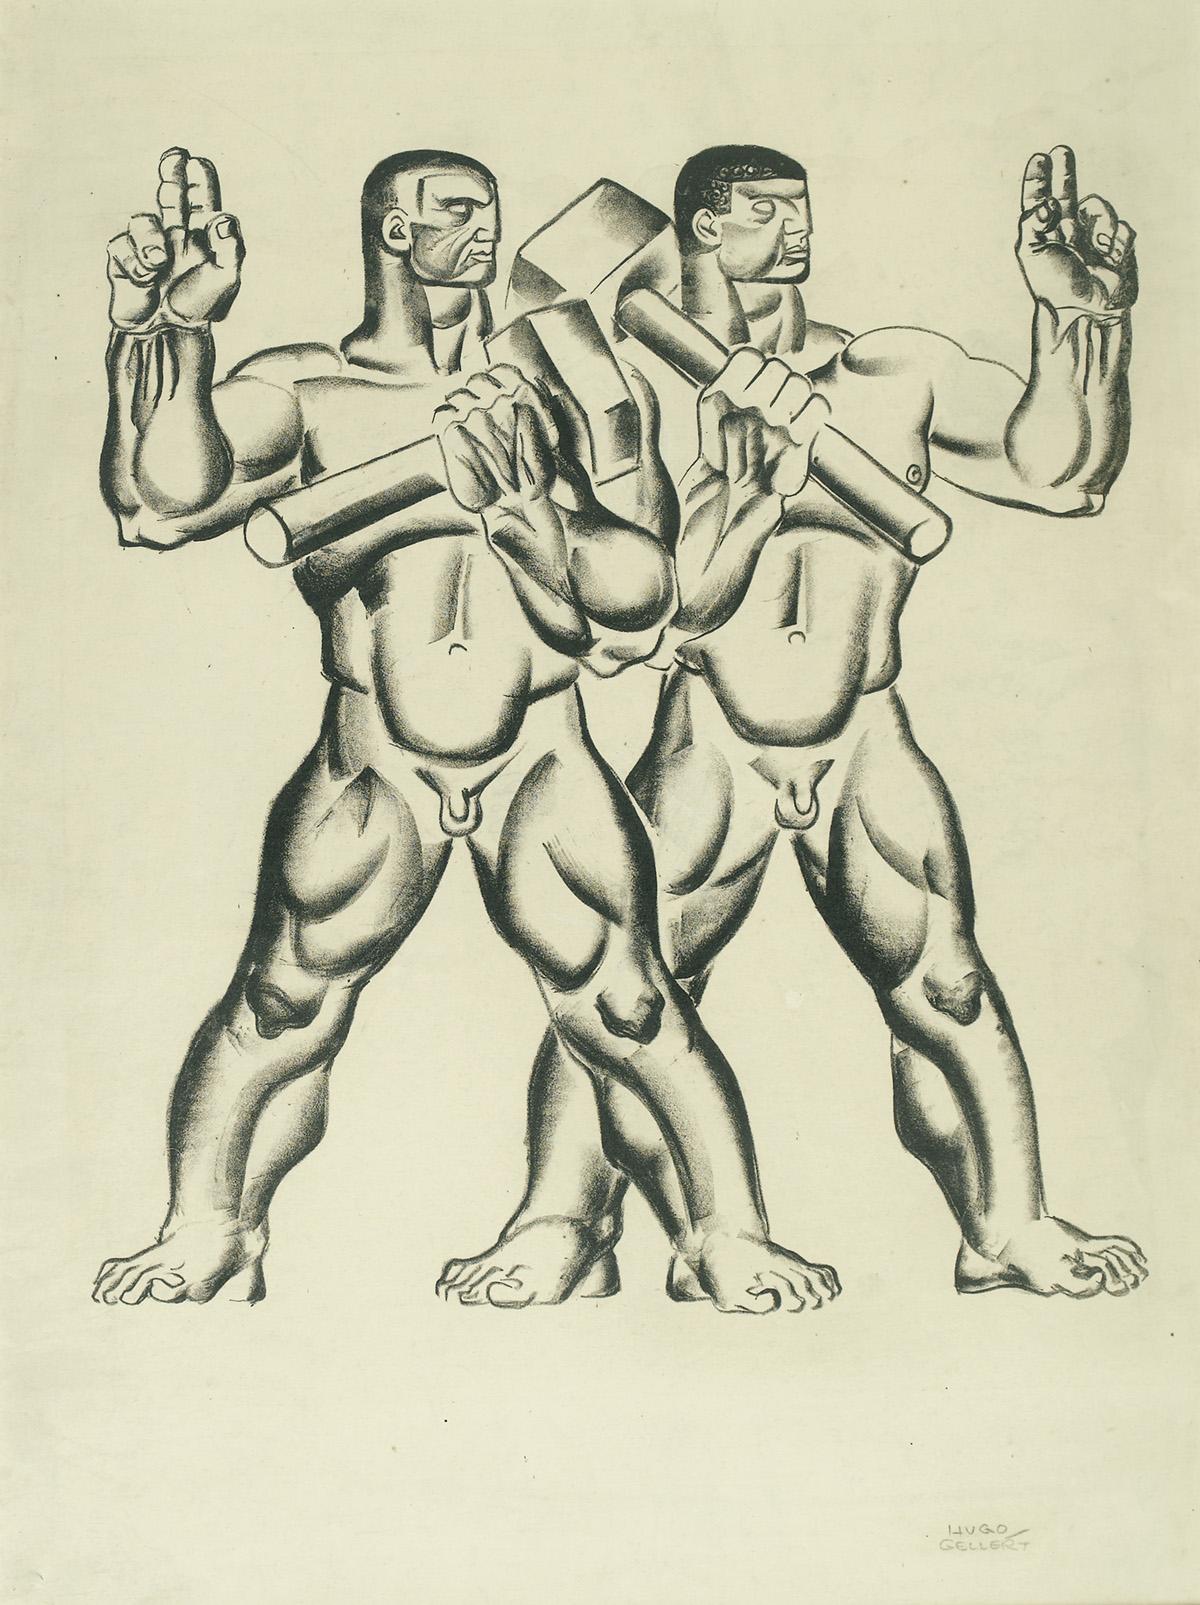 HUGO GELLERT. Workers of the World.  [KARL MARX /COMMUNISM]